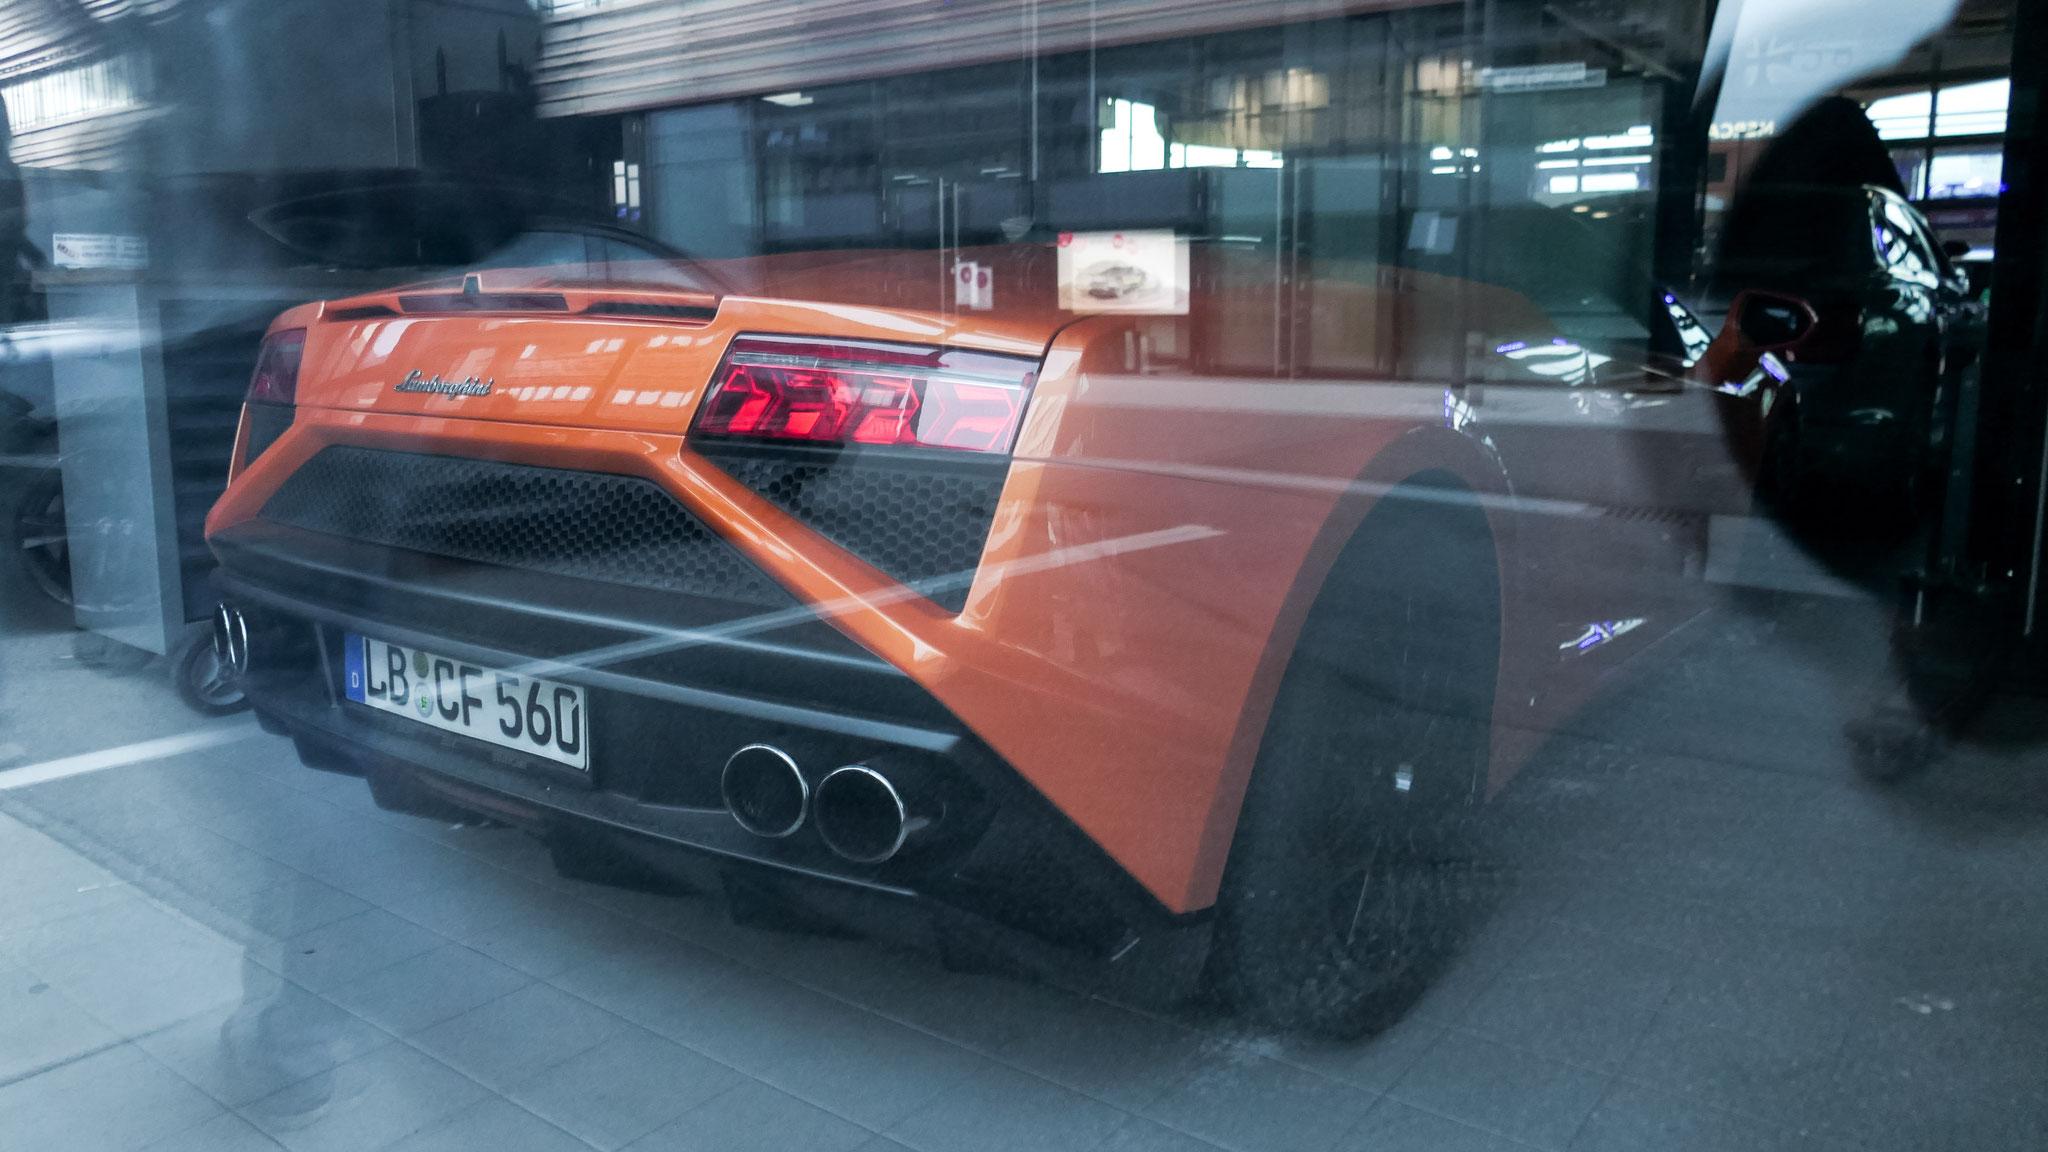 Lamborghini Gallardo LP 560 Spyder - LB-CF-560